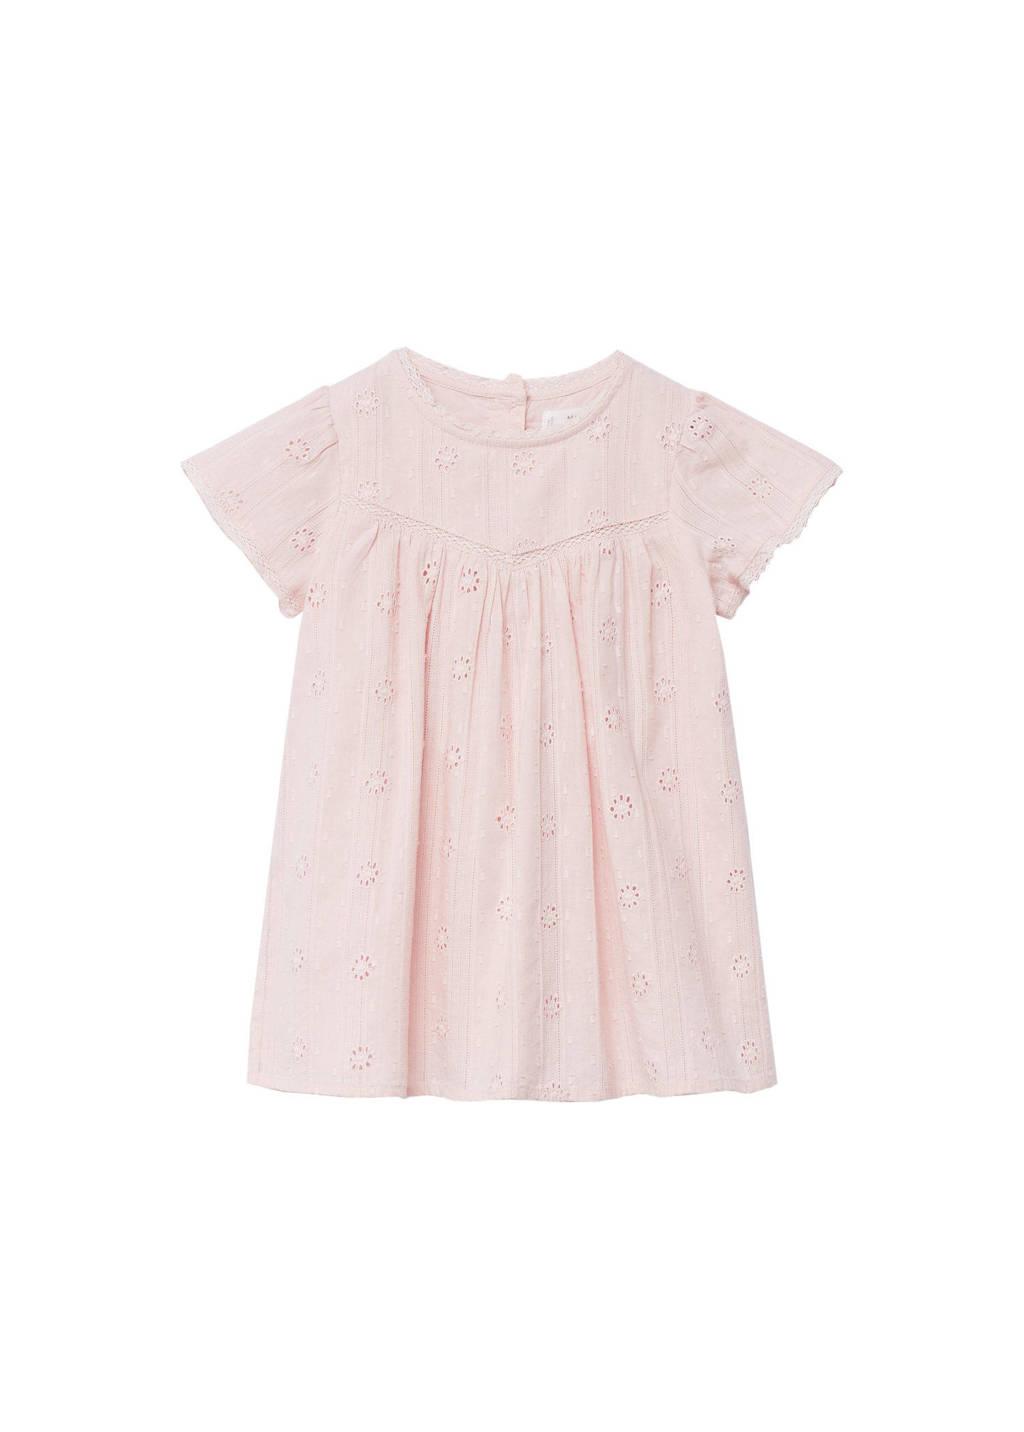 Mango Kids gebloemde A-lijn jurk pastelroze, Pastelroze